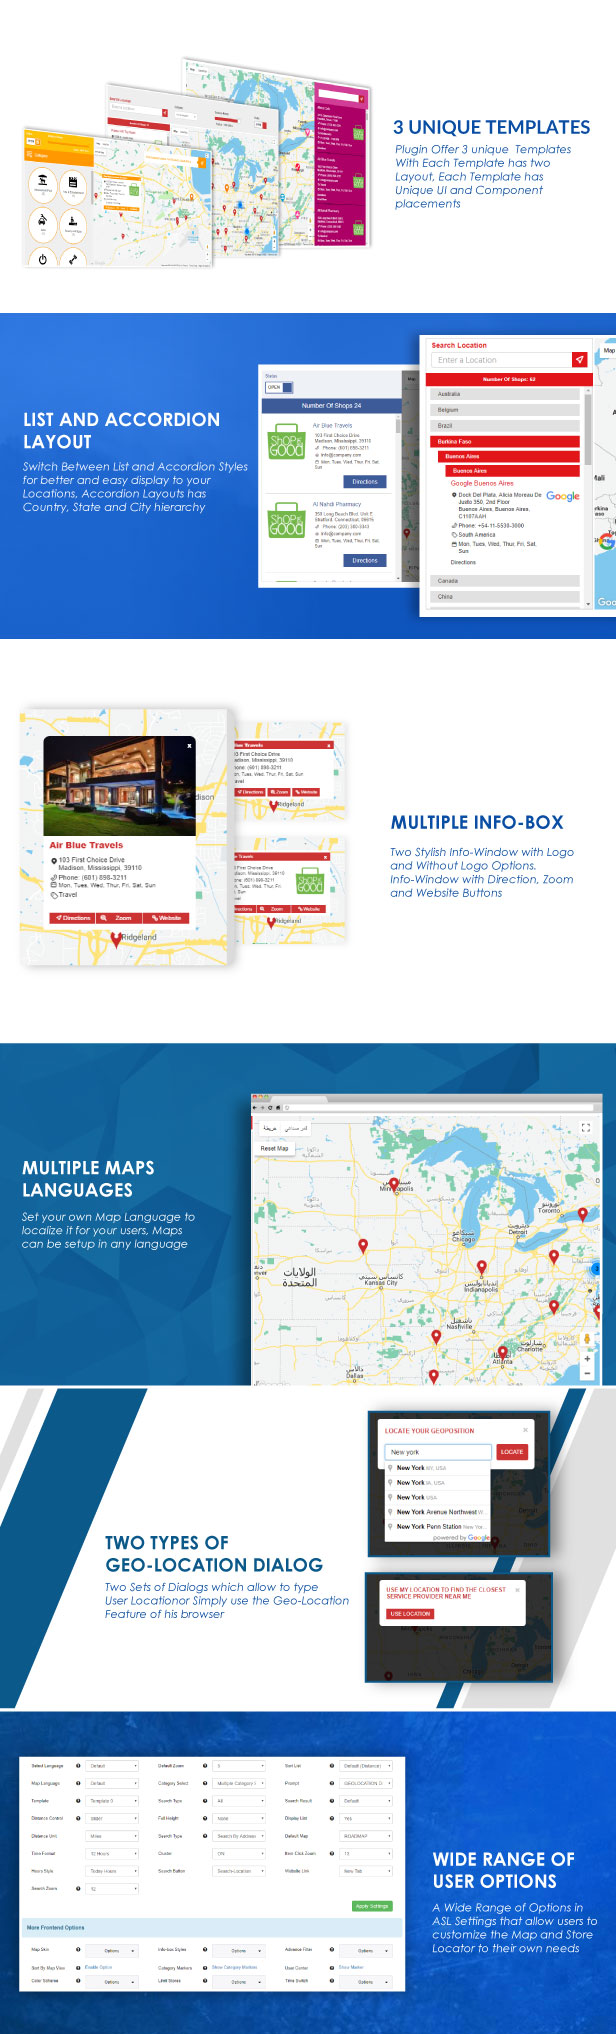 Store Locator (Google Maps) For WordPress - 6